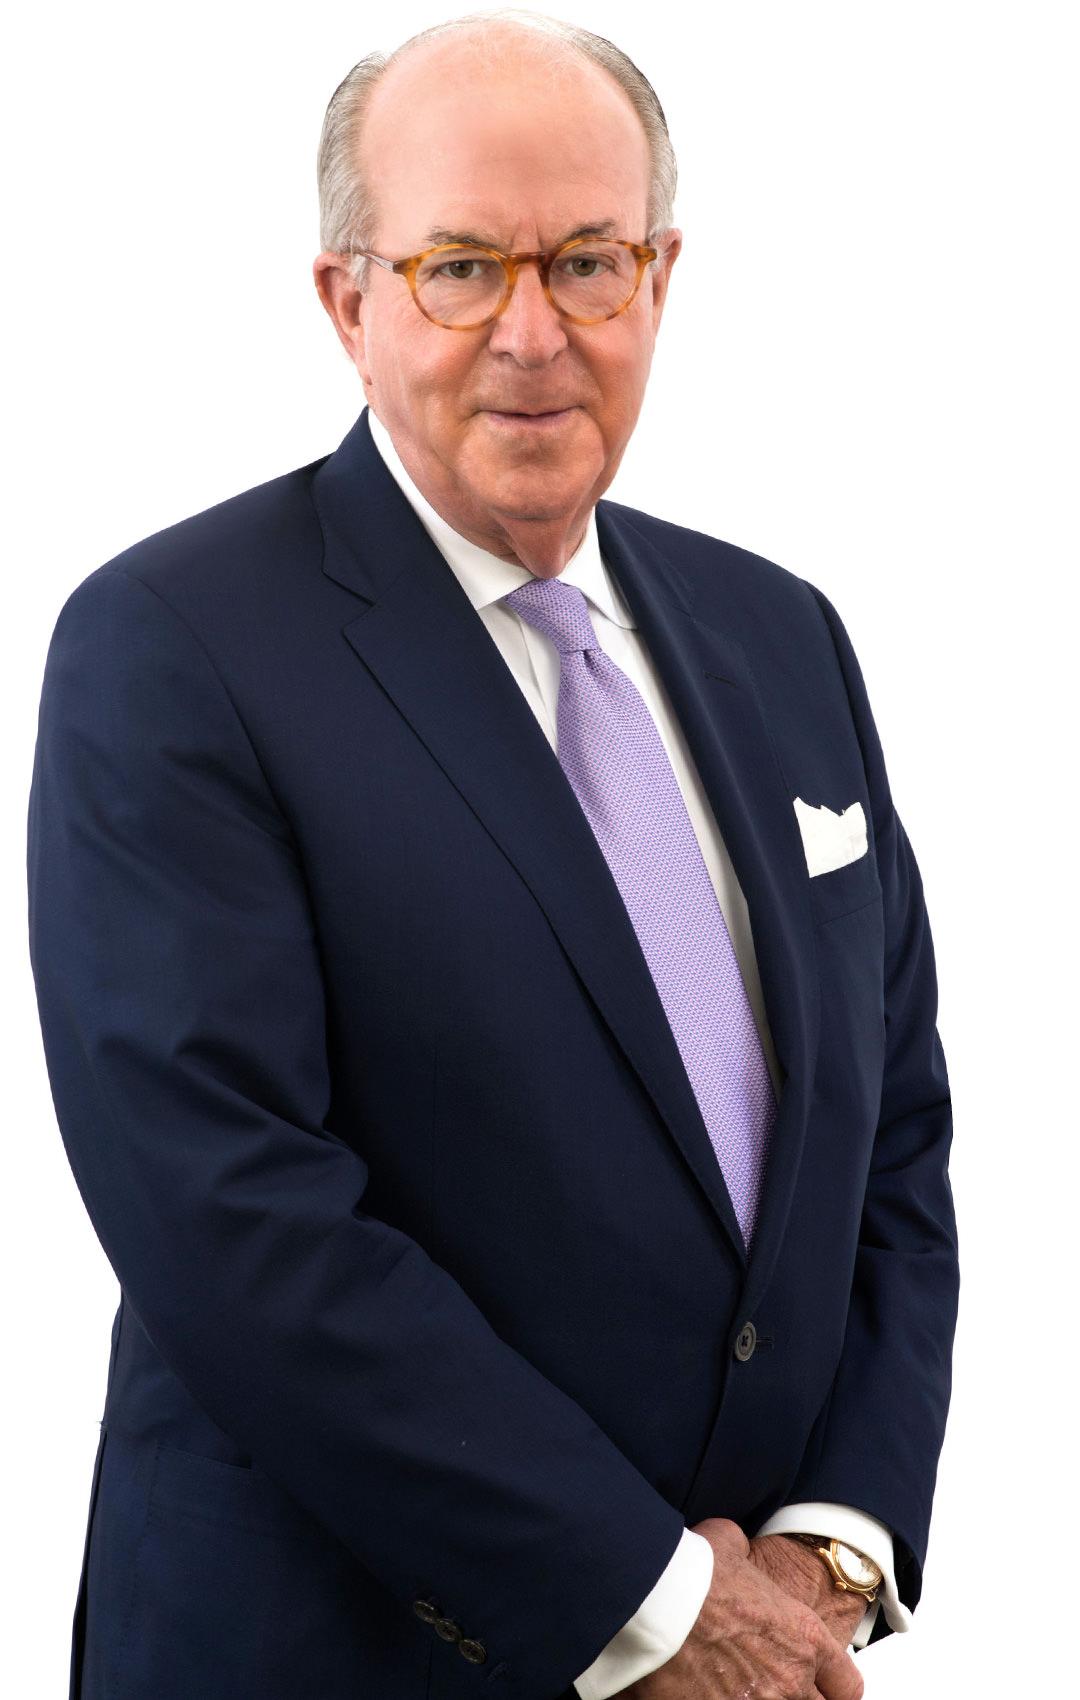 Robert B. Crowe